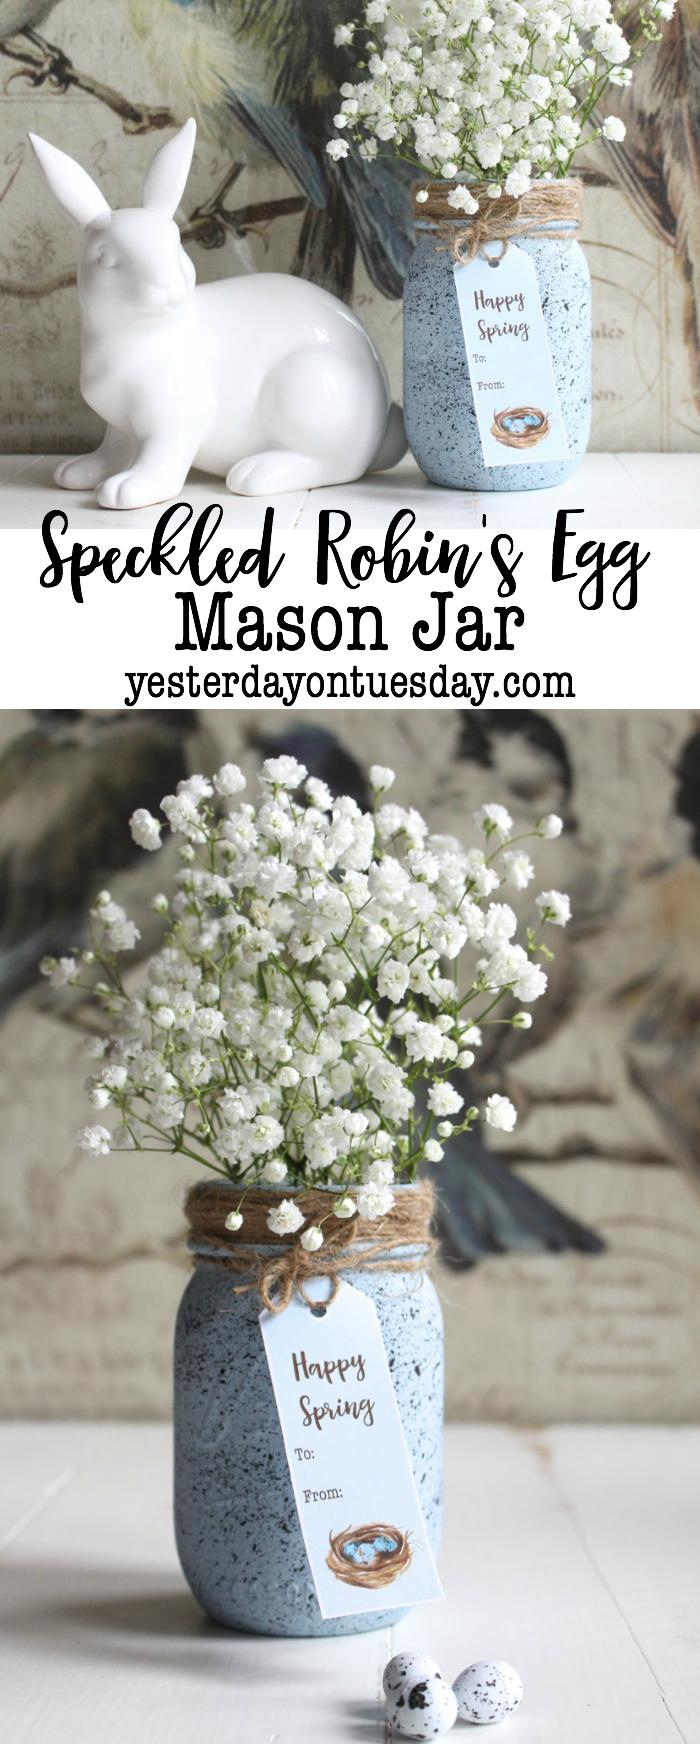 37 Speckled Robin's Egg Mason Jar